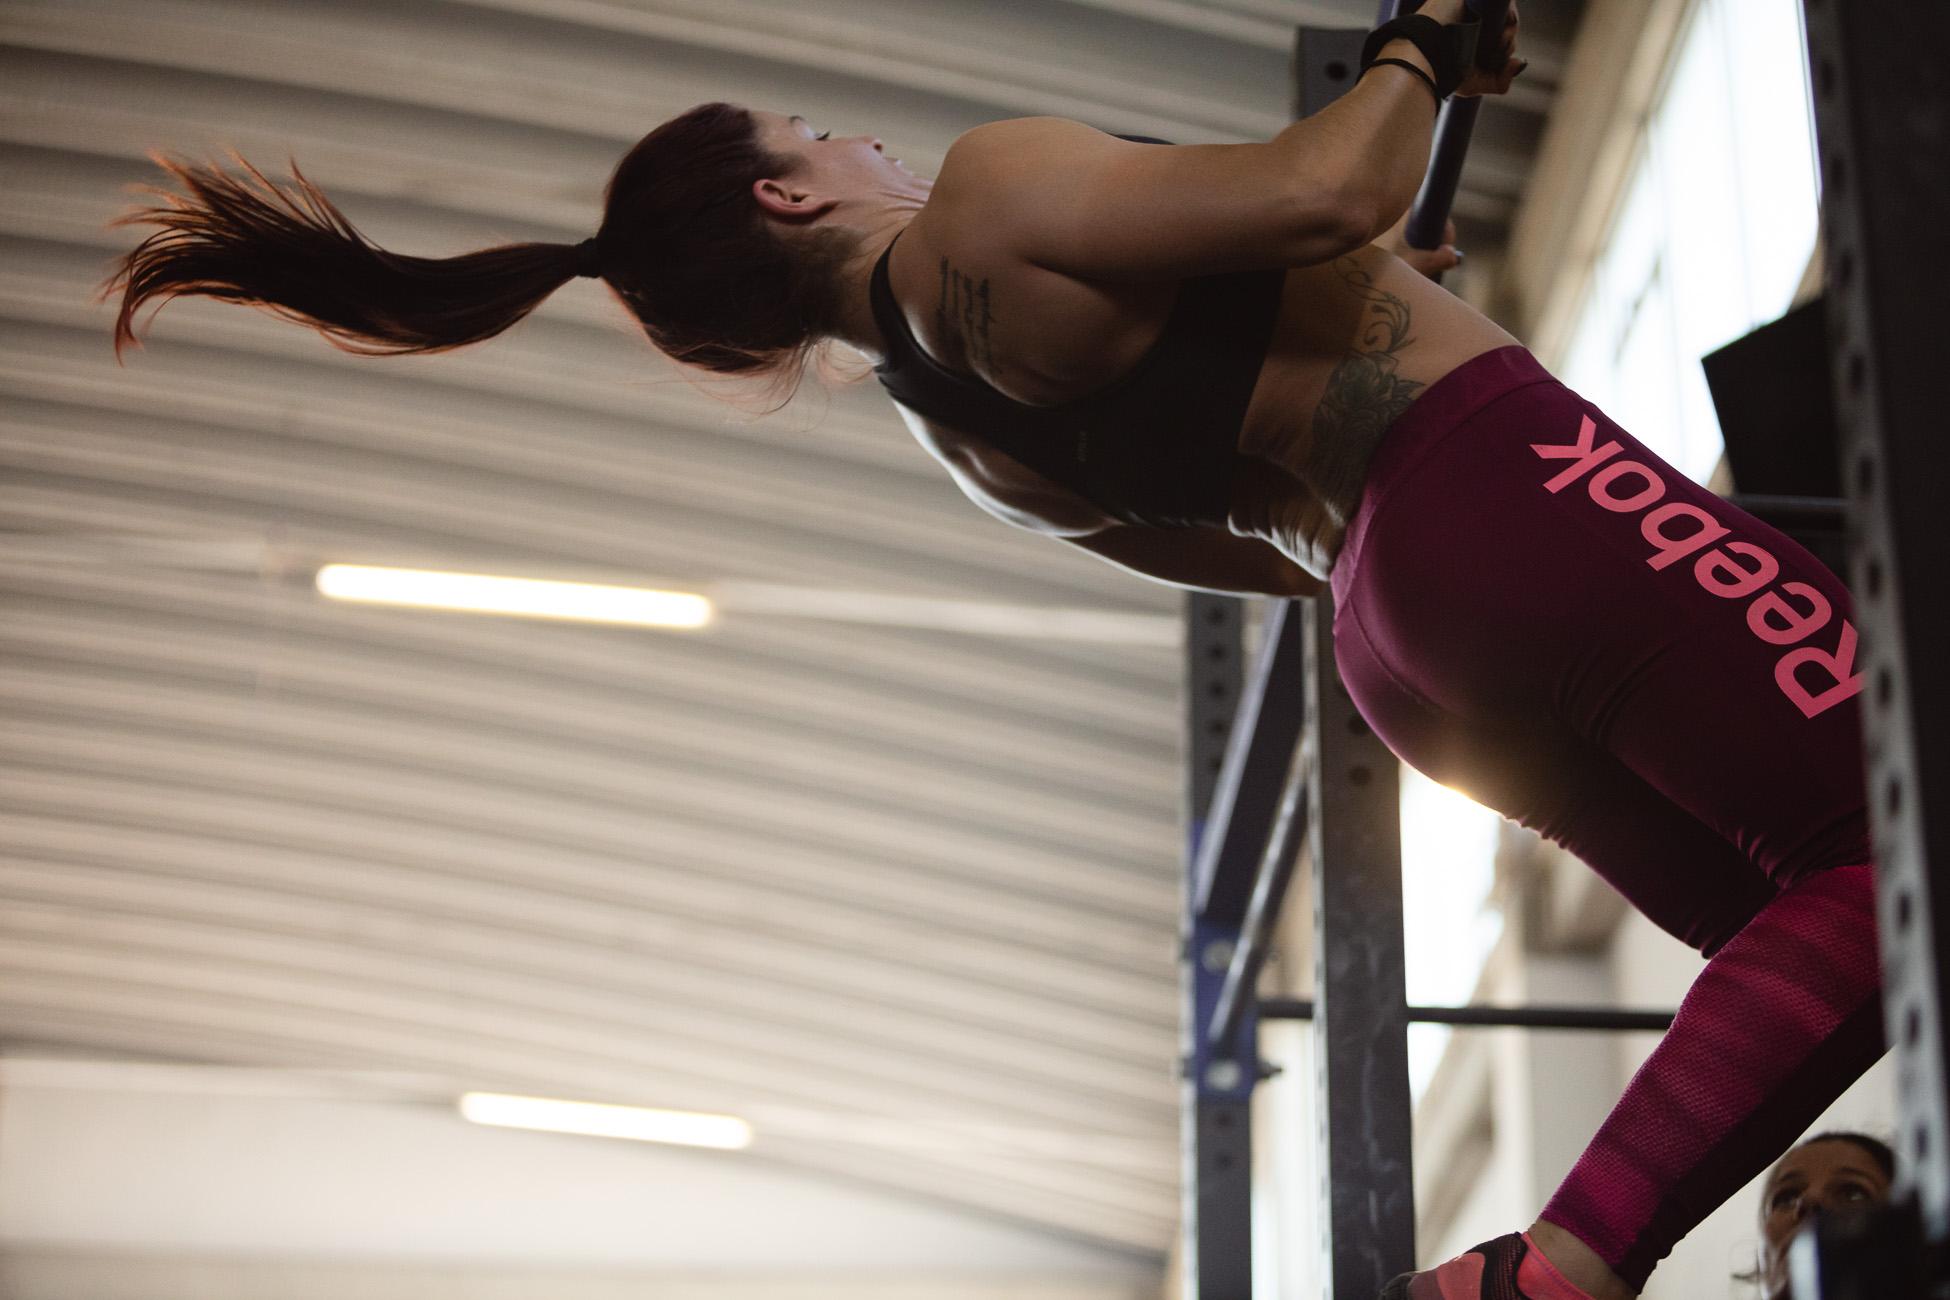 crossfit-games-open-fitness-lifestyle-desporto-atleta-fotografia-009.jpg